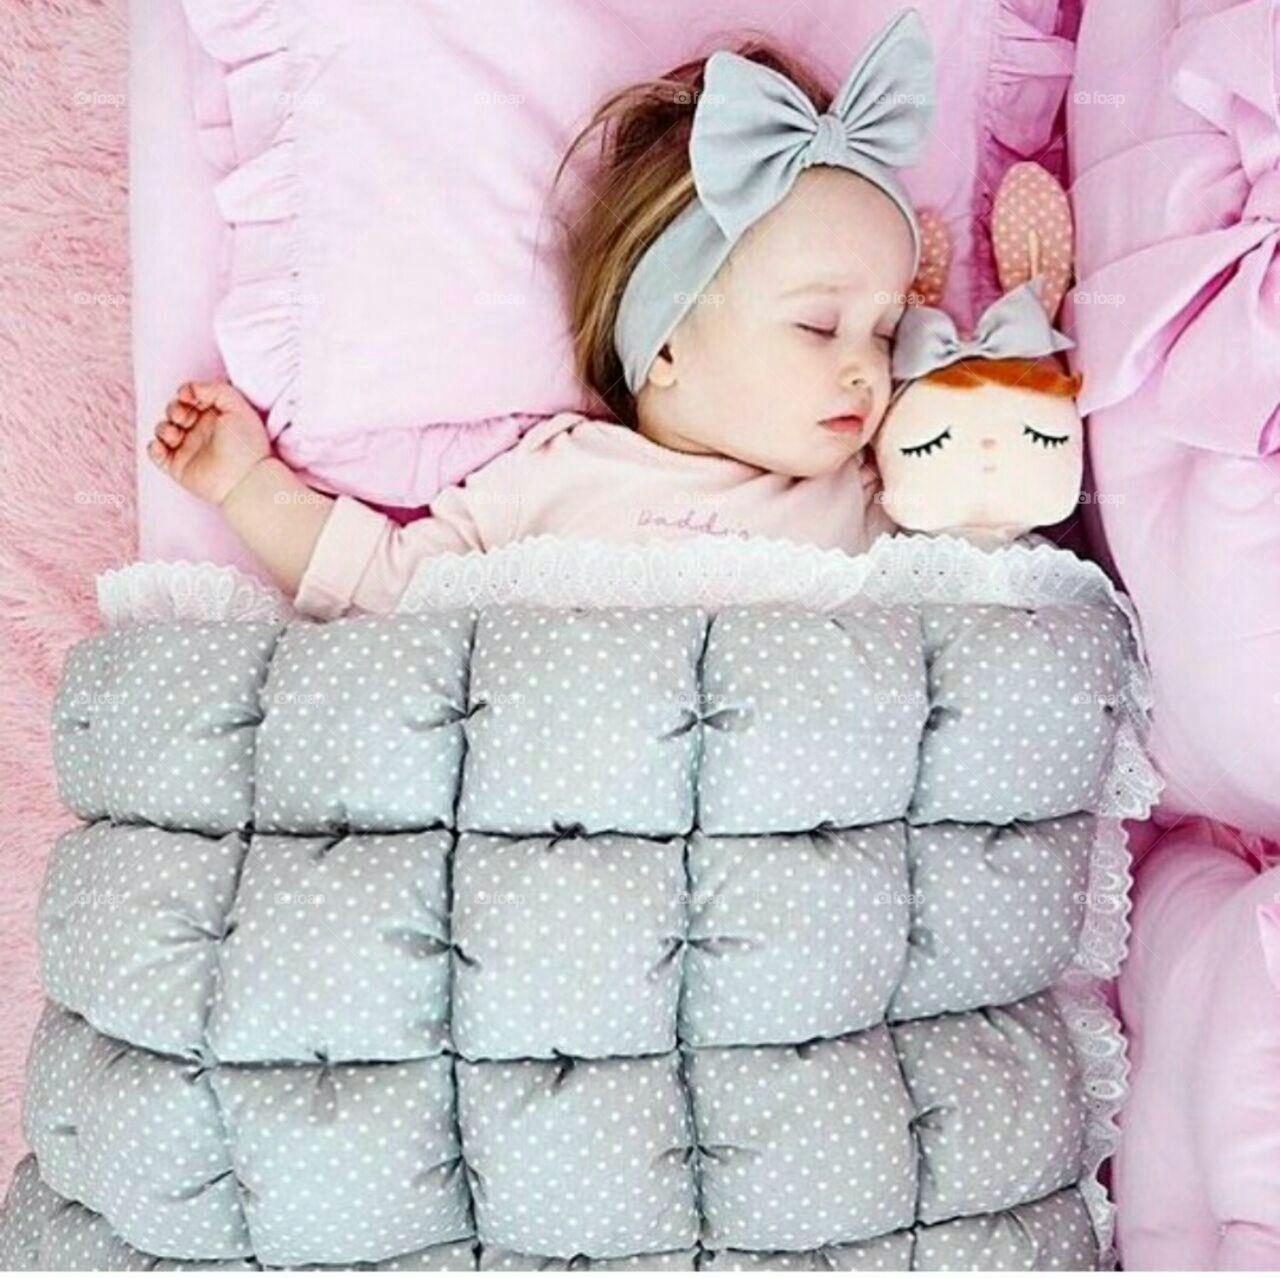 Image of: Good Morning Nice Baby Cute Sleep Foap Foapcom Nice Baby Cute Sleep Stock Photo By Aahmad69